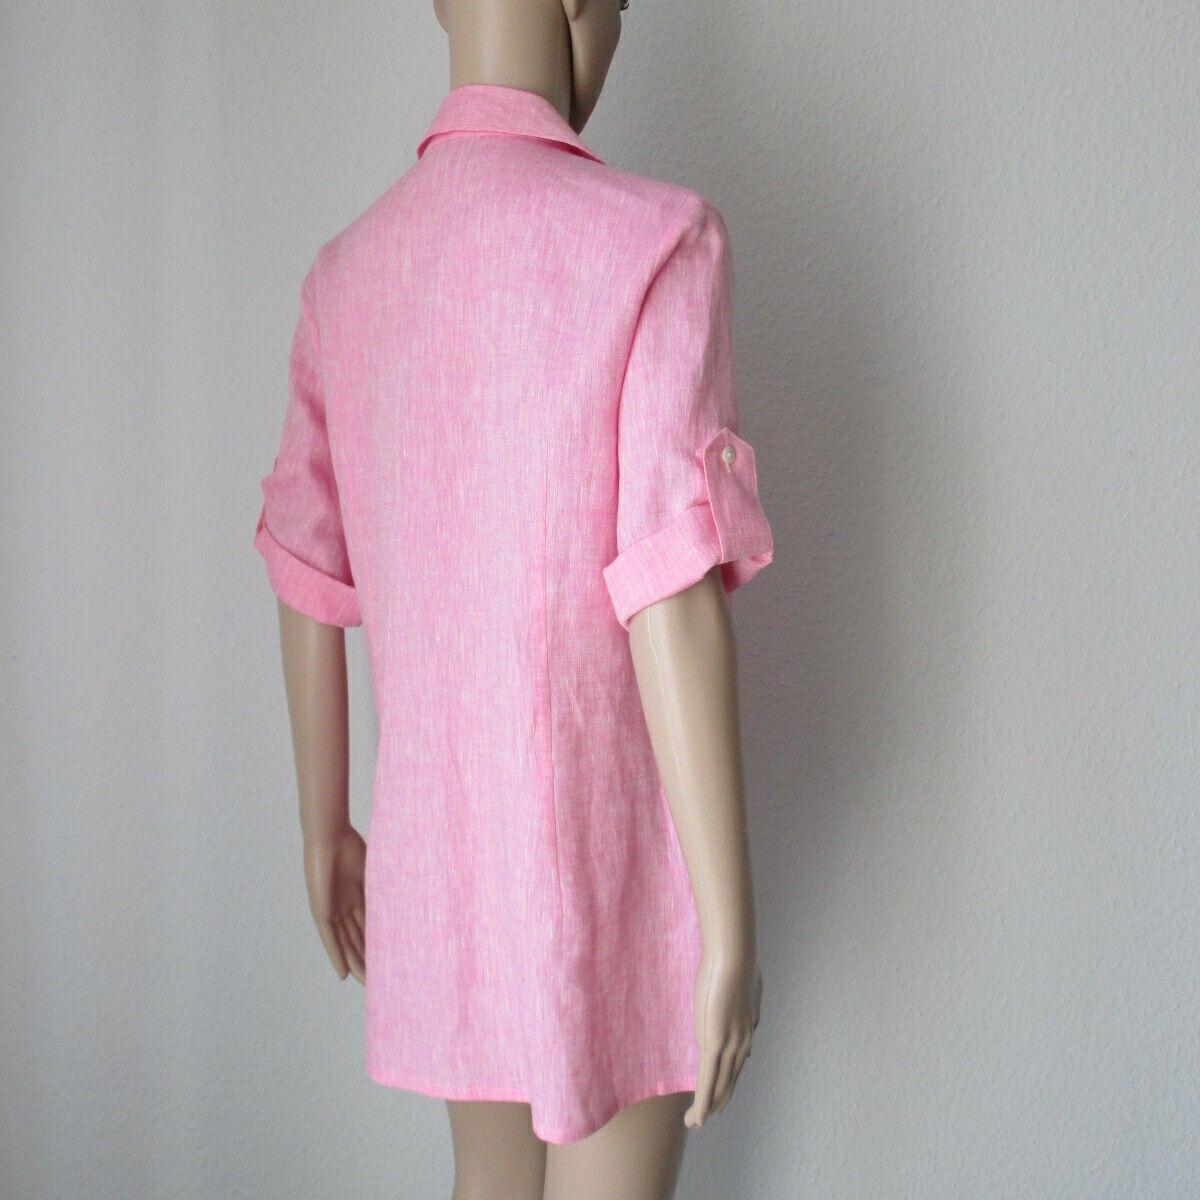 B. M. Company Tunika aus Leinen, lang in der Farbe Rosa, Größe 36